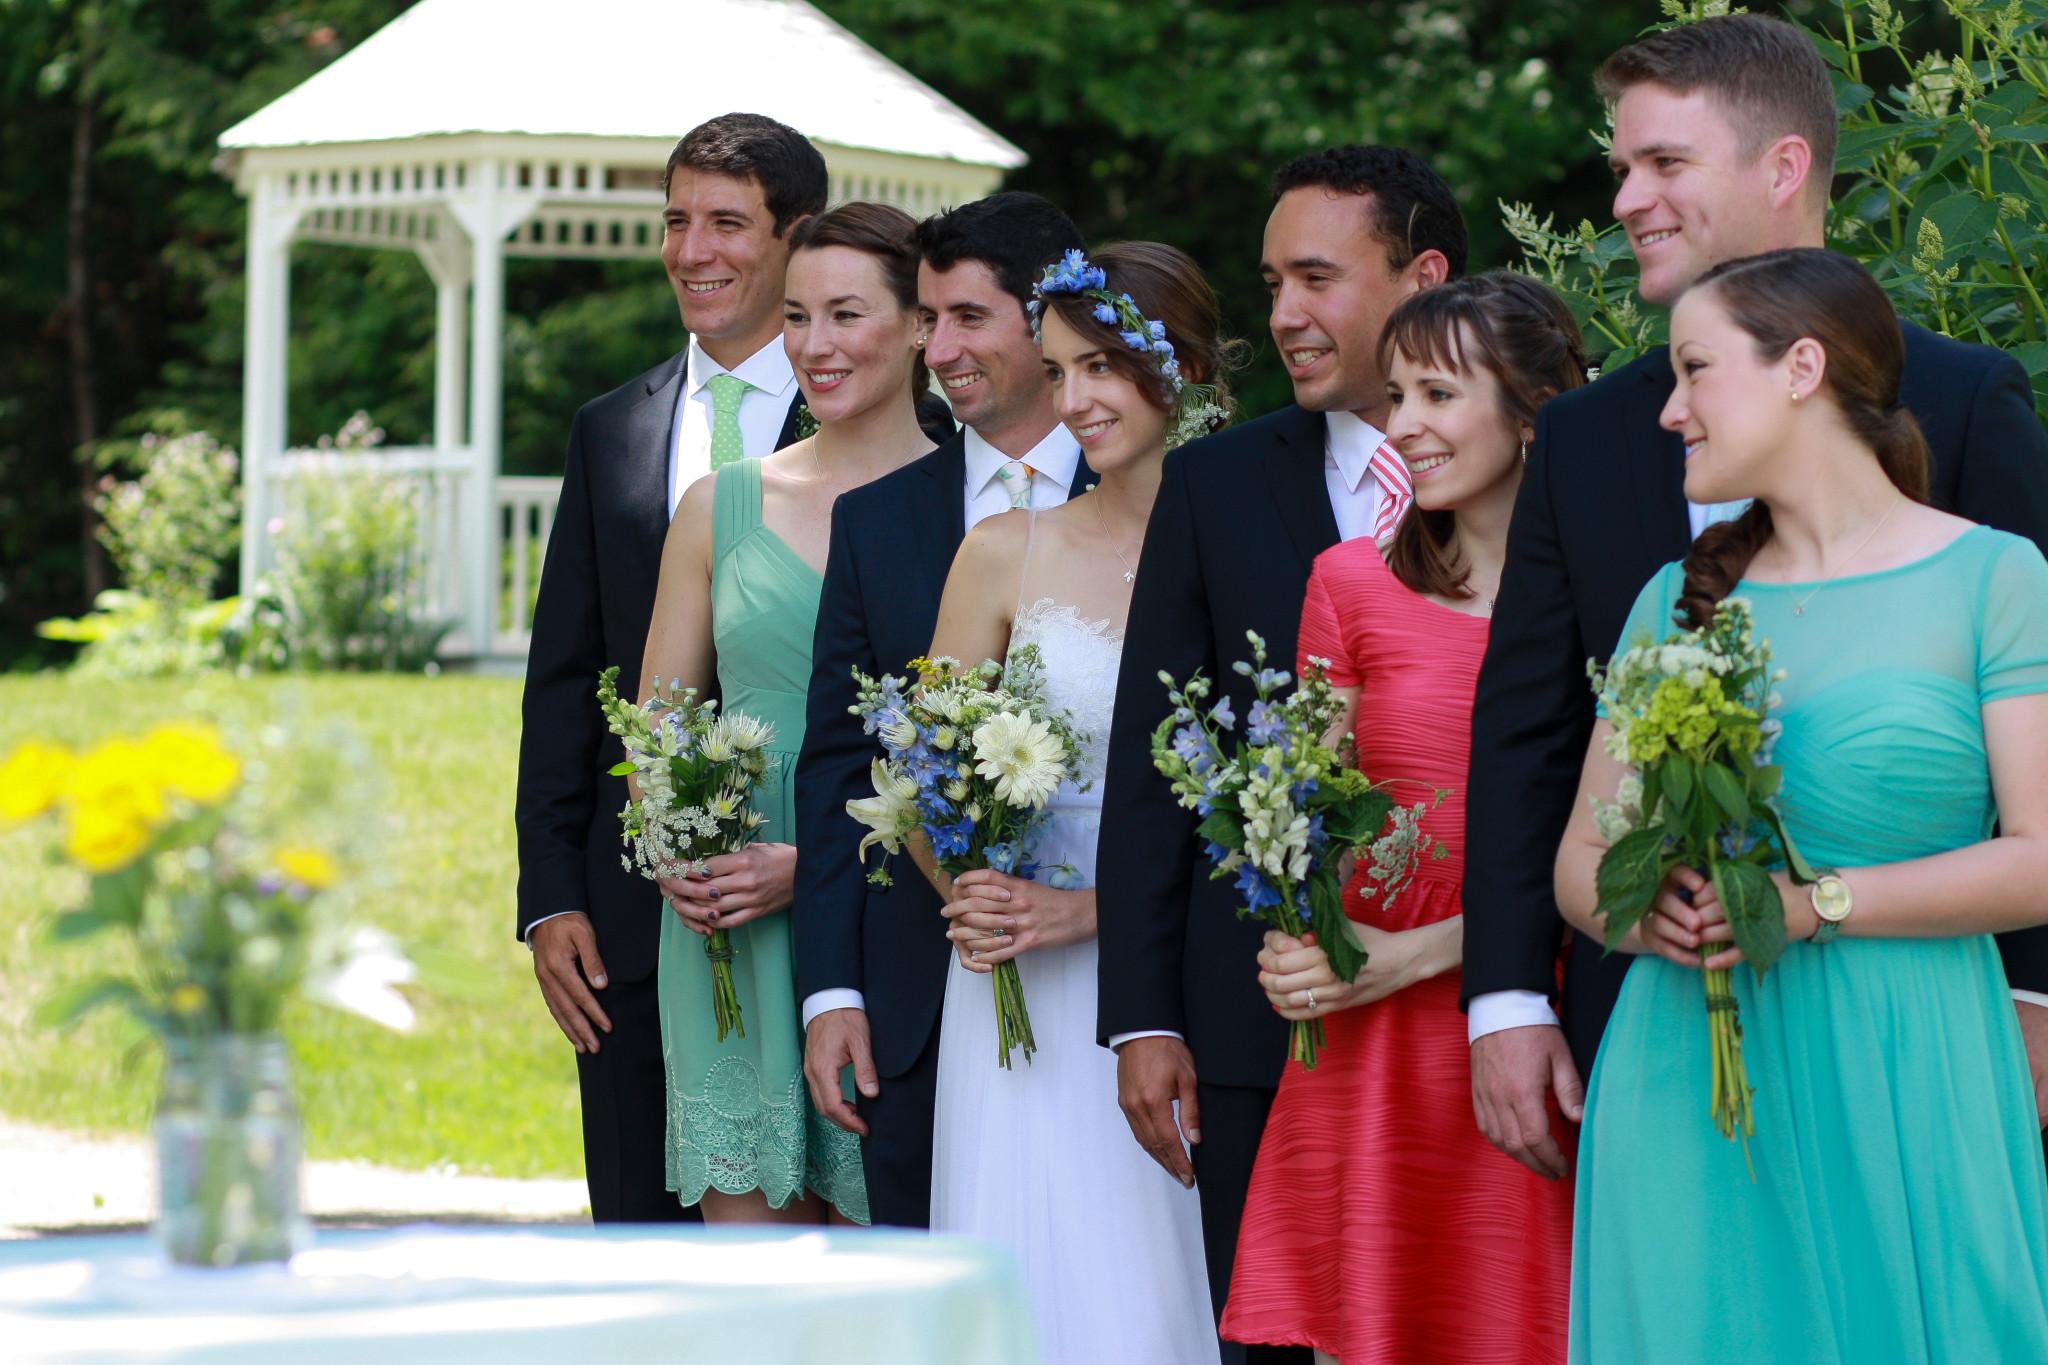 cassidy-wedding-party.jpg